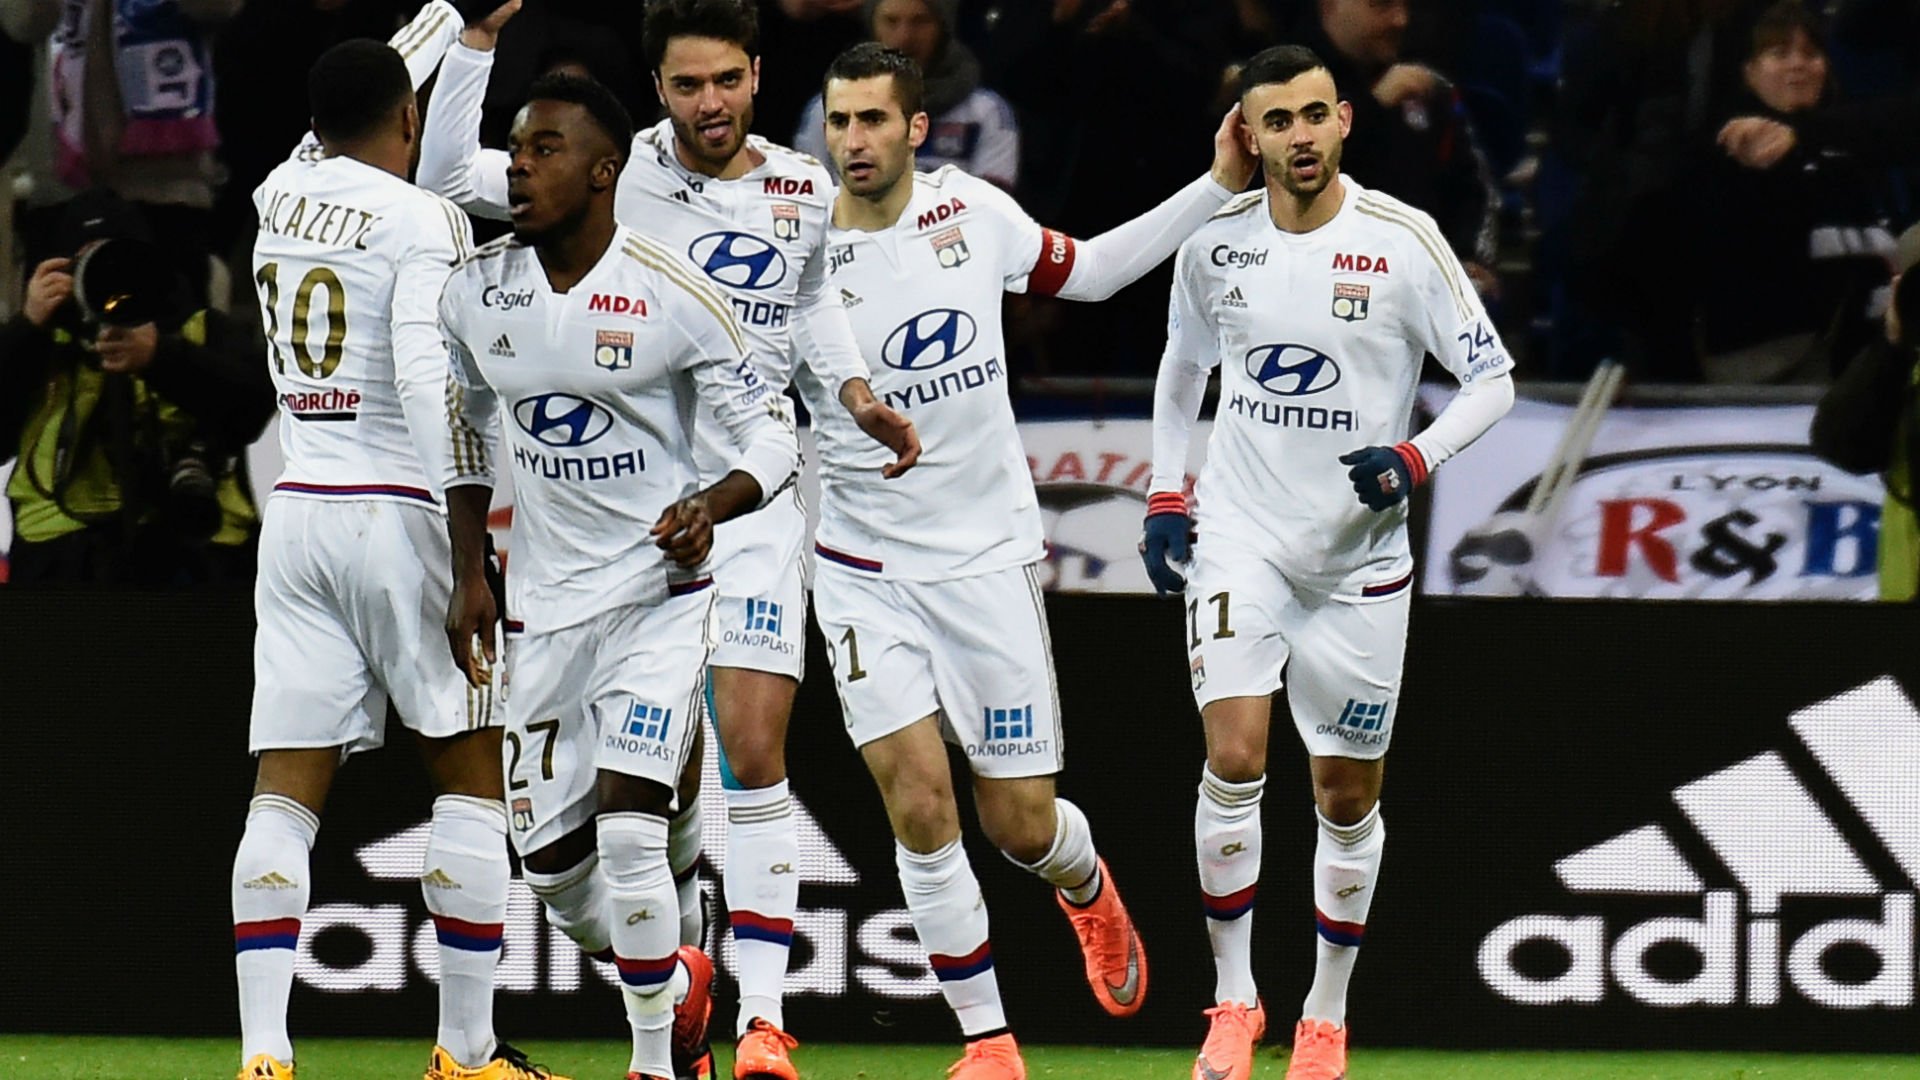 Video: Olympique Lyon vs Guingamp